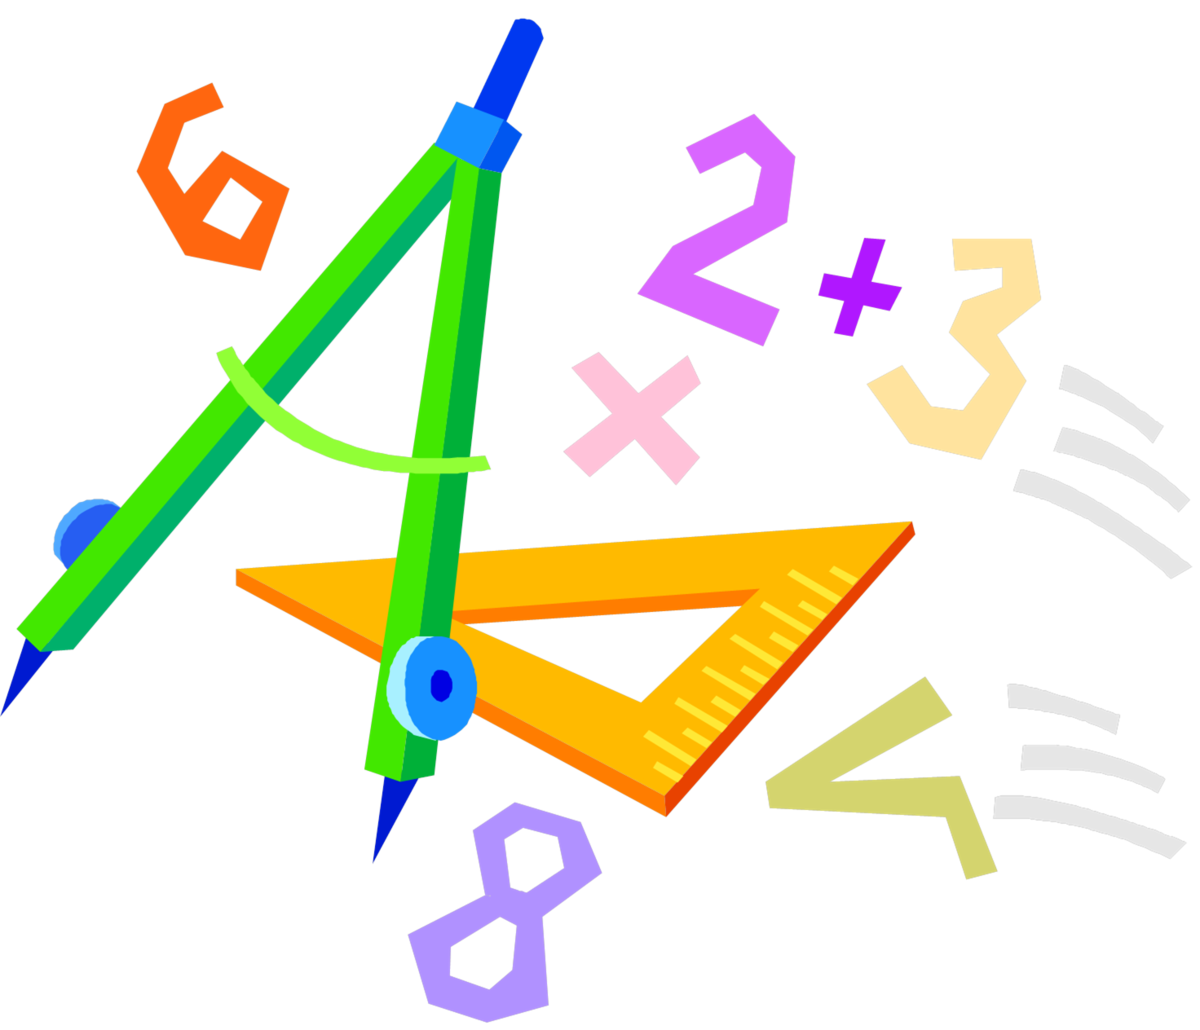 Математика рисунки картинки